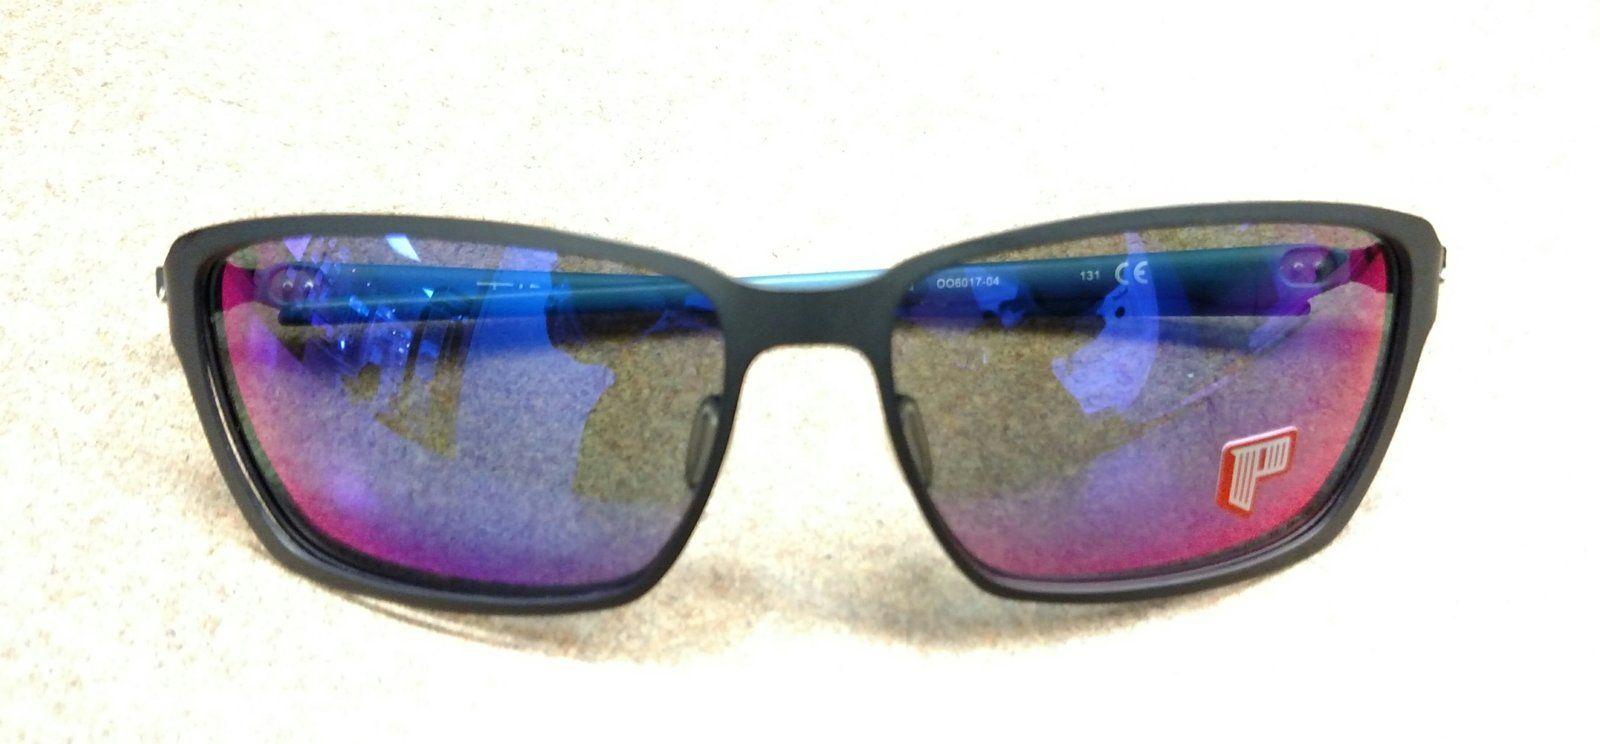 62e2cdfb44653 Sold - Tincan Carbon! Matte Black OO6017-04 Excellent Polarized  85 ...